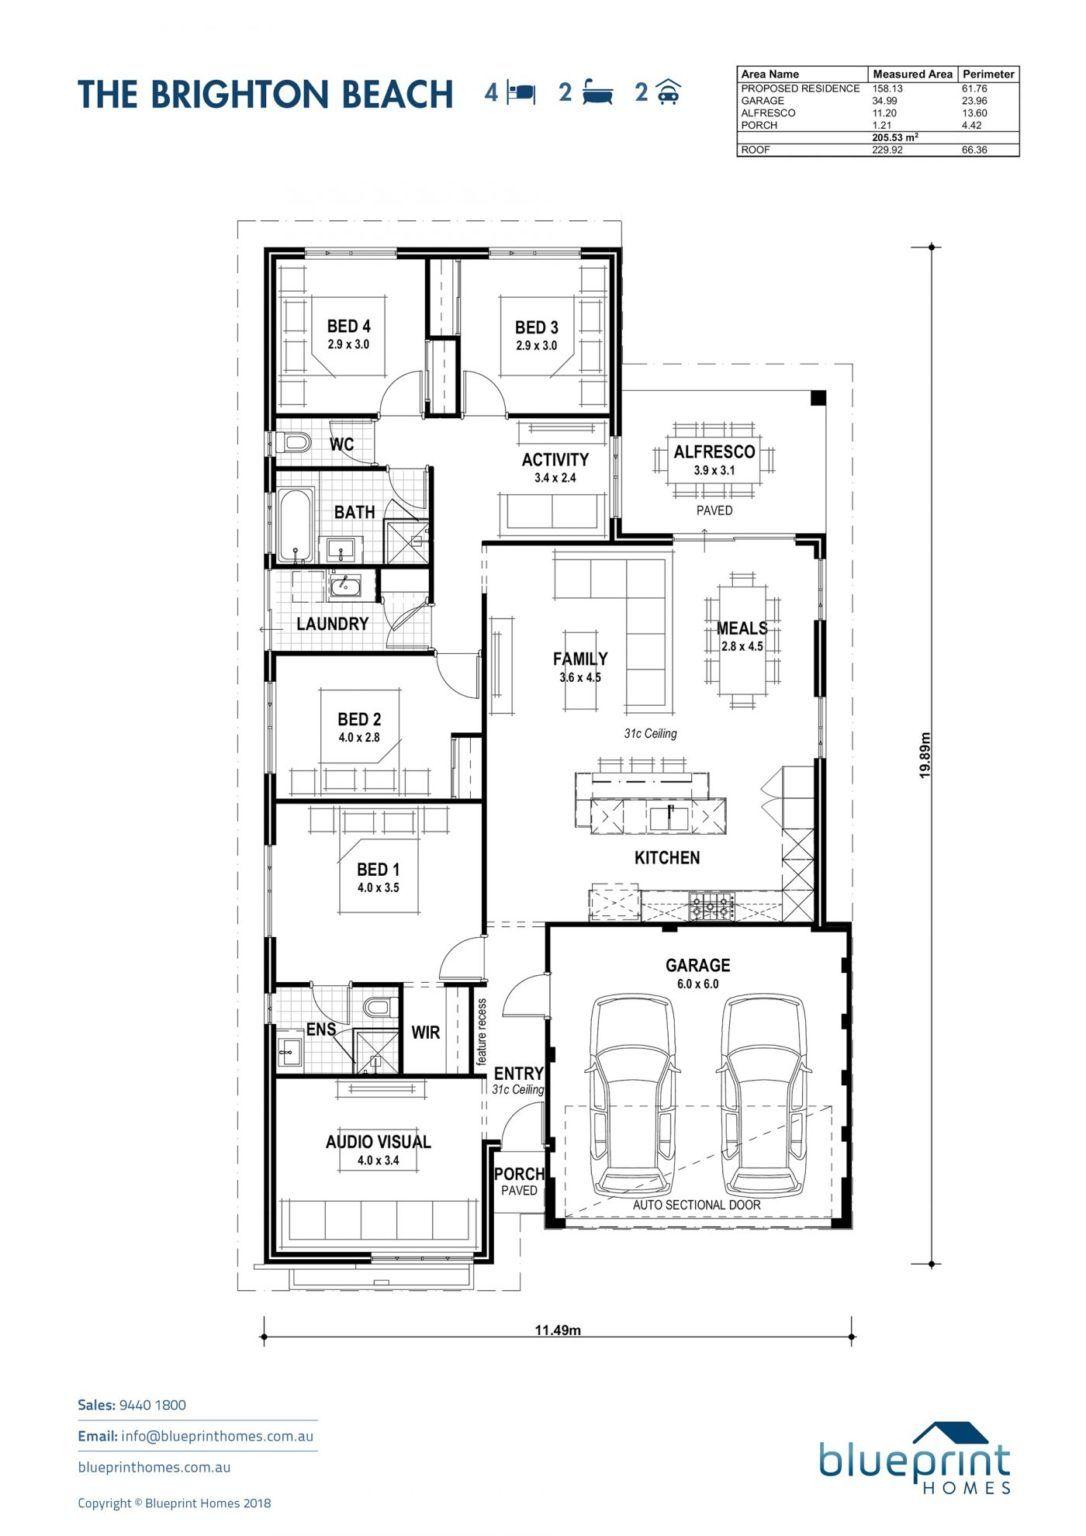 Brighton Beach Perth Home Design In 2020 Bungalow House Design